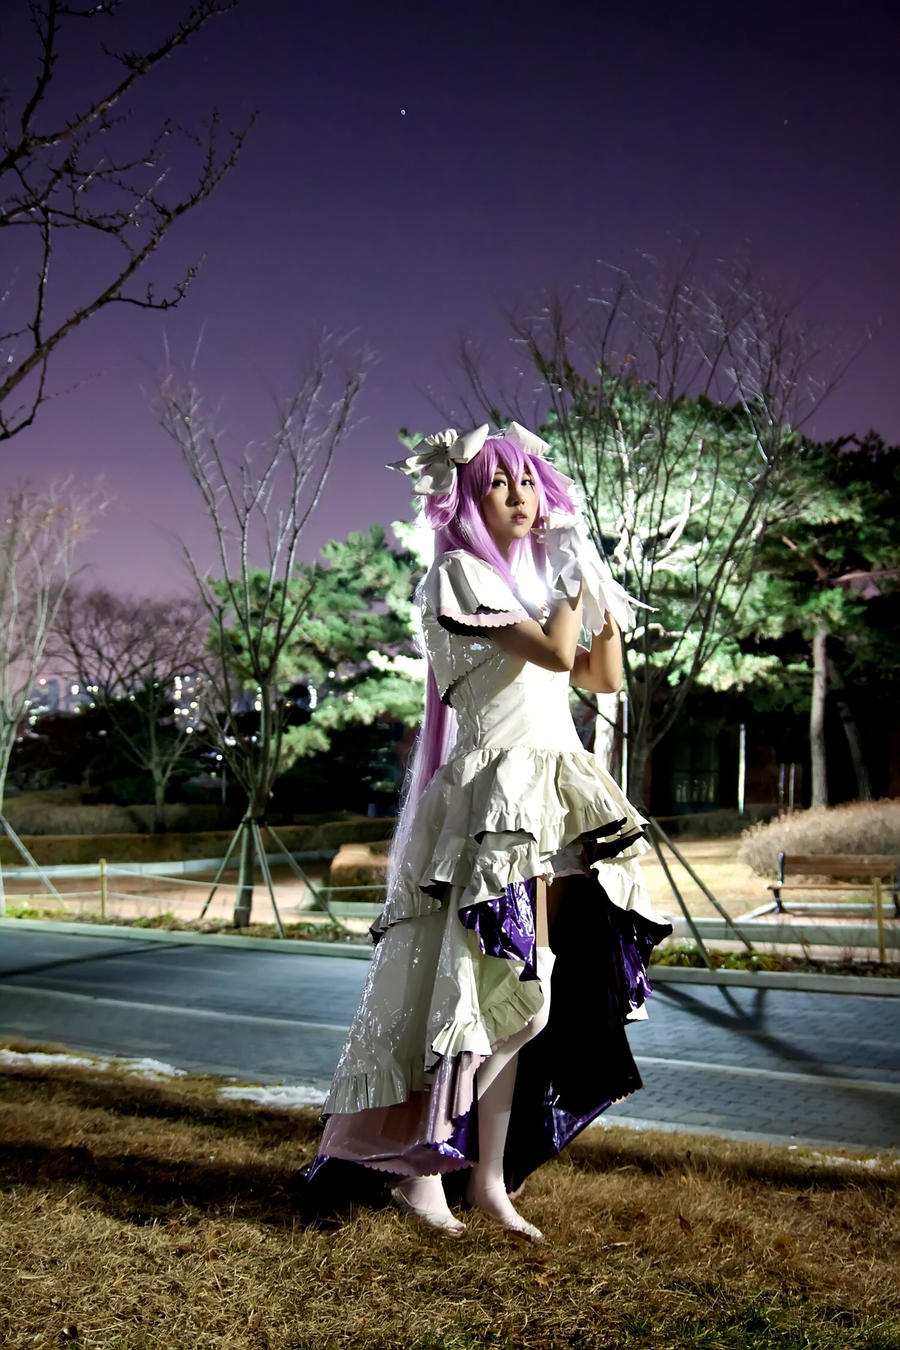 Ultimate Madoka cosplay by Choumai on DeviantArt  Ultimate Madoka...